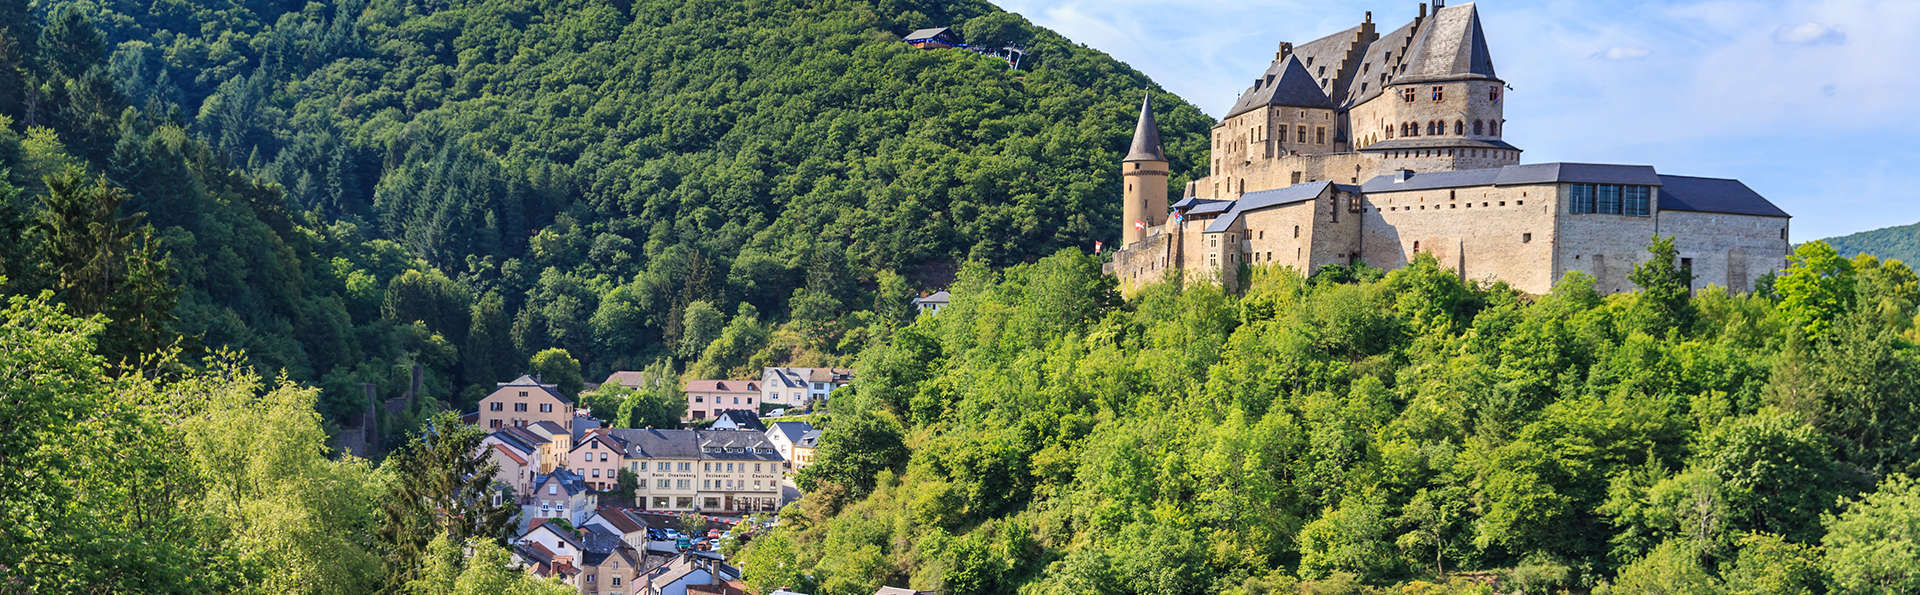 Van der Valk Hotel Luxembourg - Edit_Luxembourg.jpg